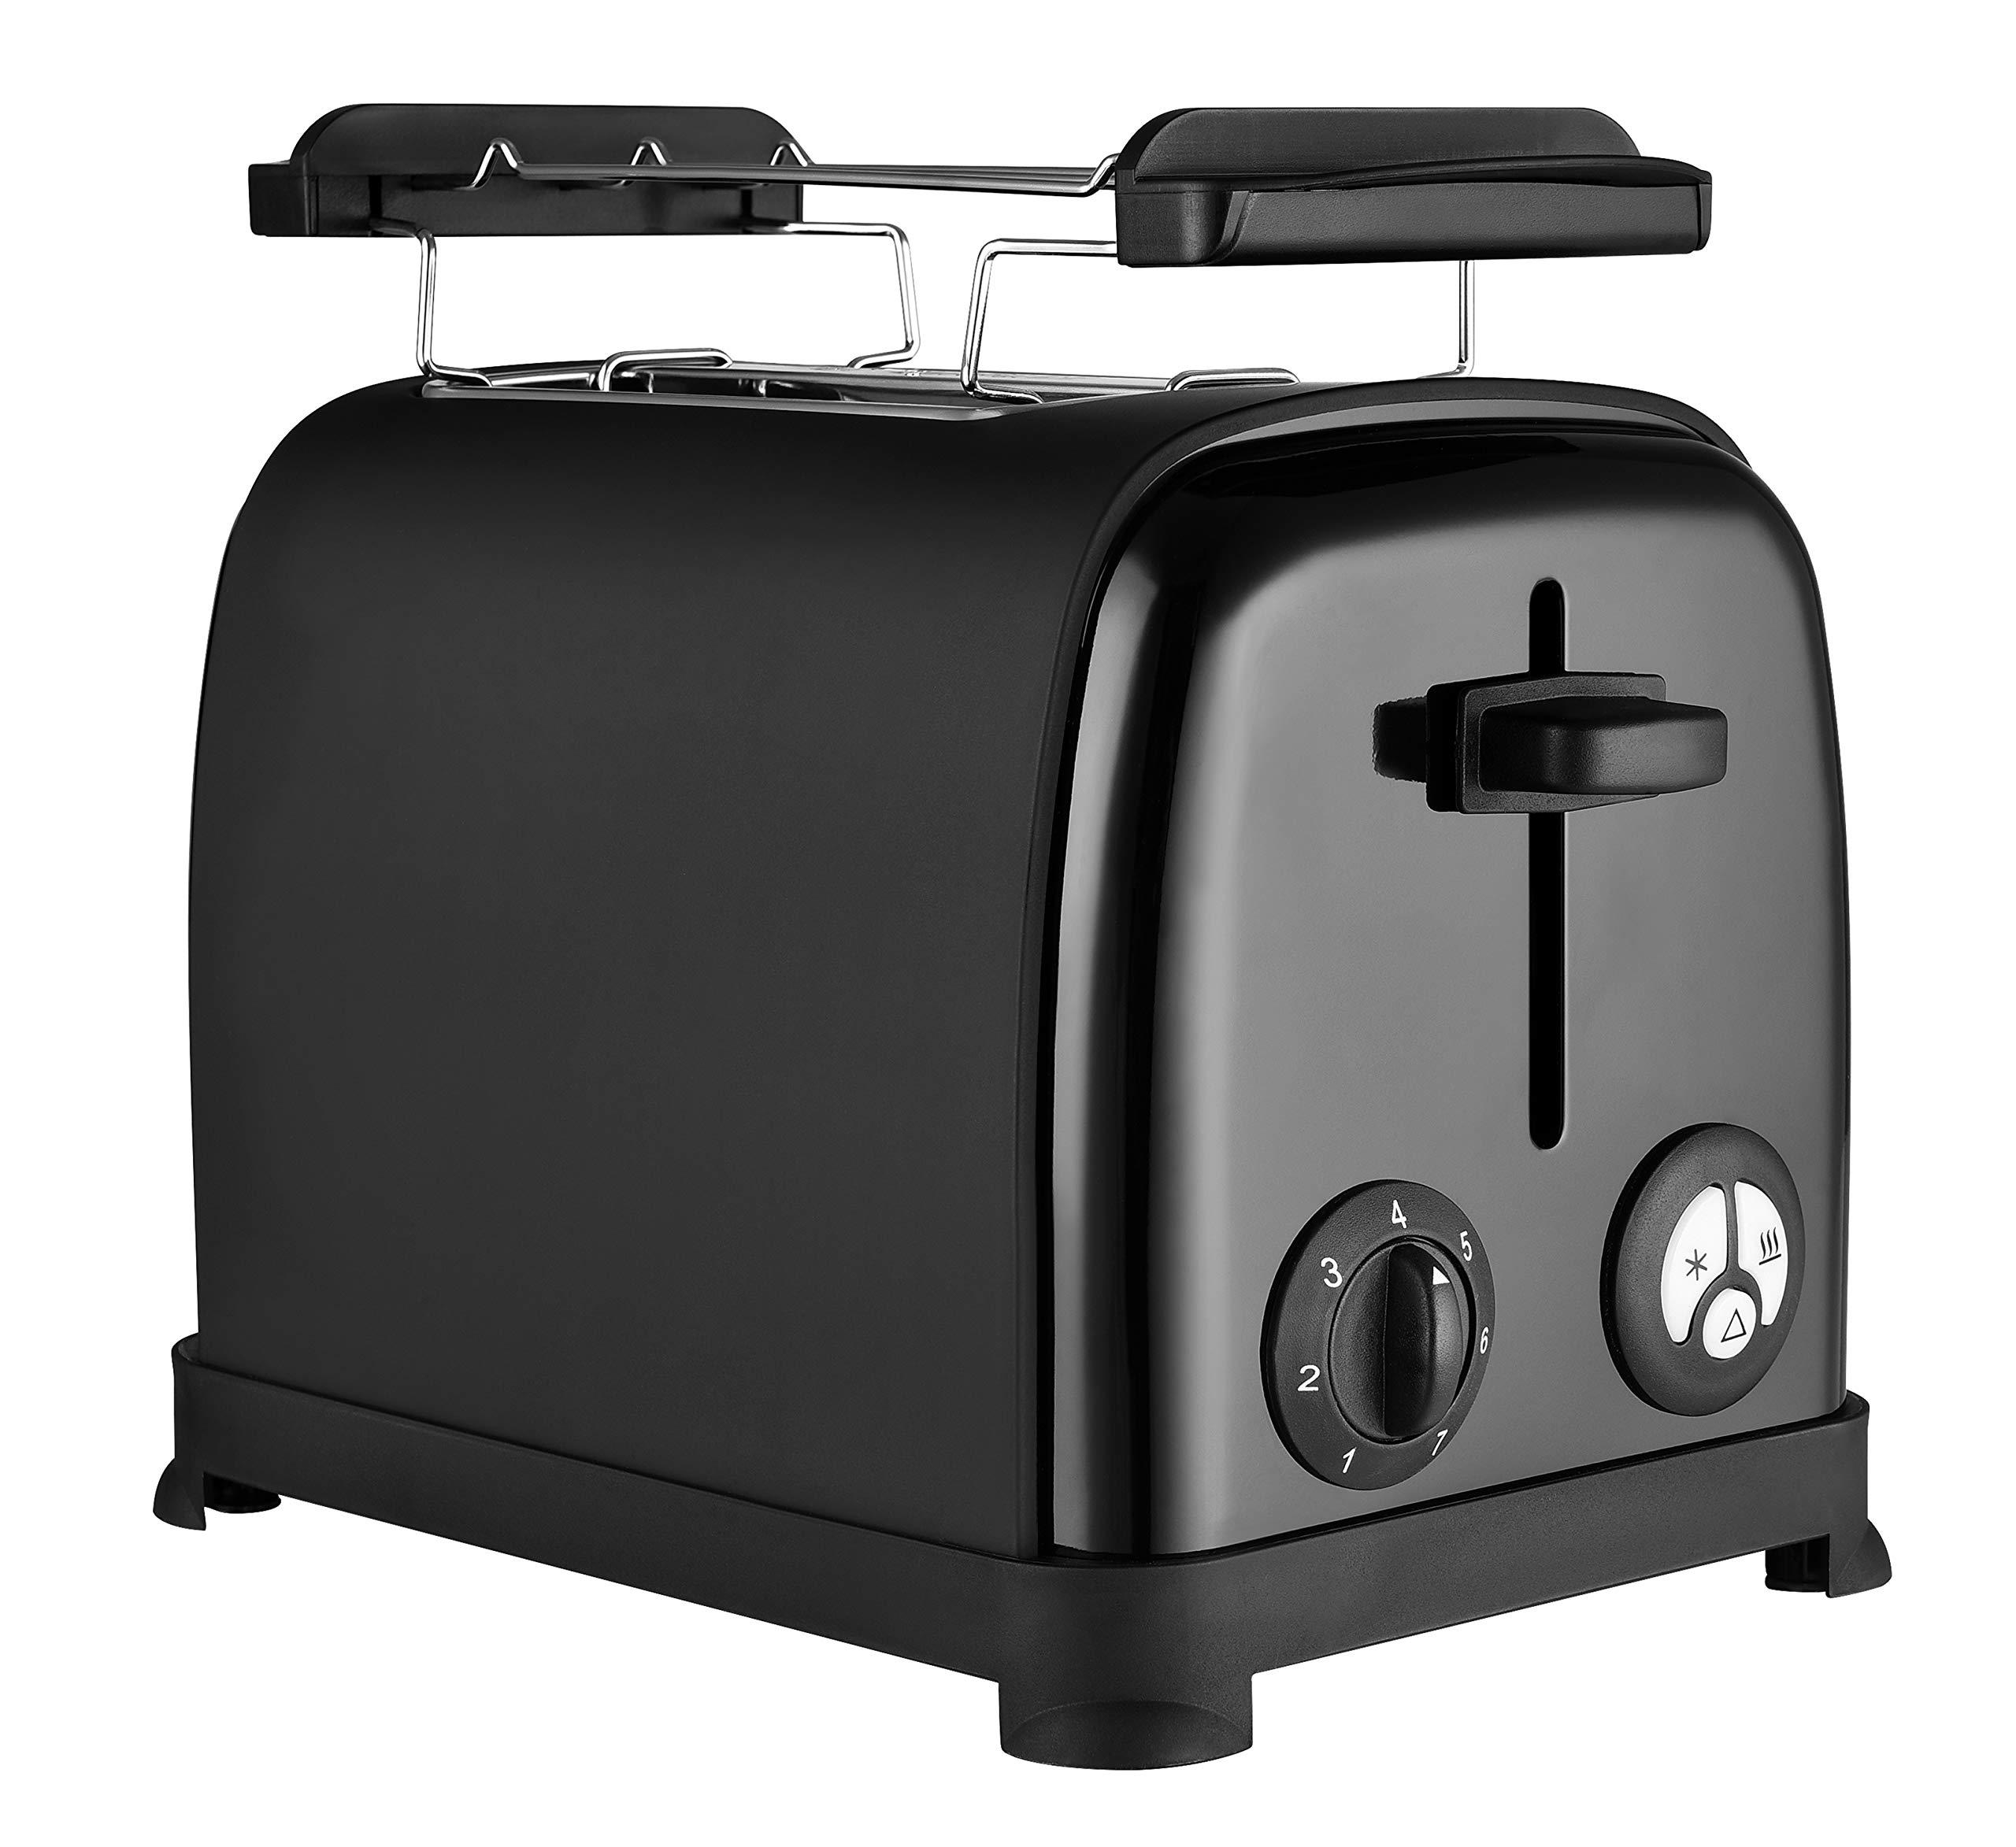 Venga-VG-to-3004-Toaster-950-Edelstahl-Kunststoff-Schwarz